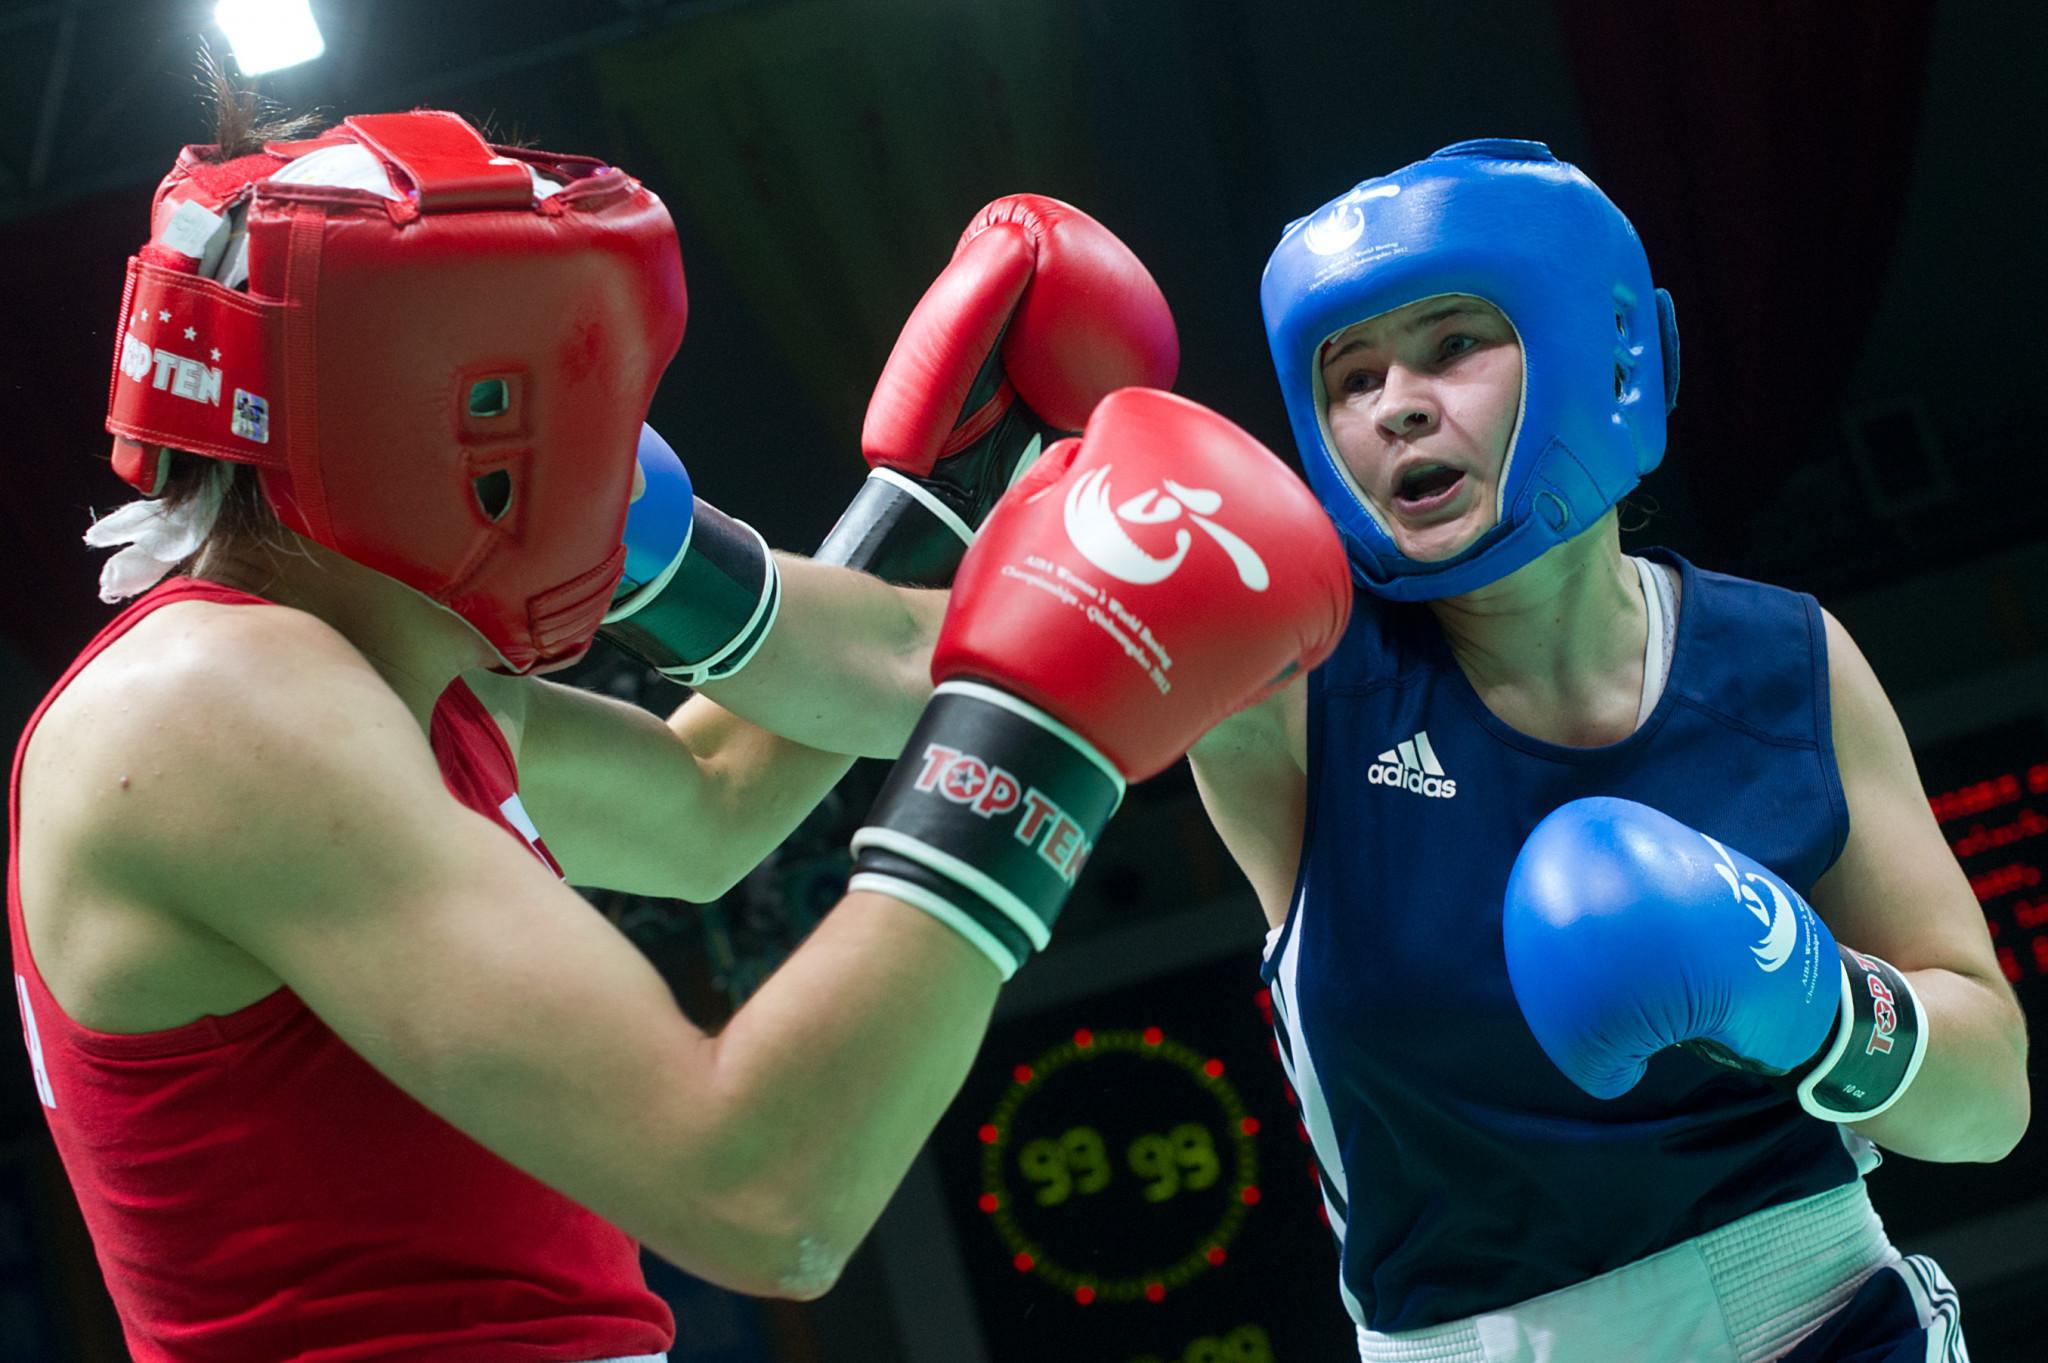 European champion Abramova wins at World Military Boxing Championships